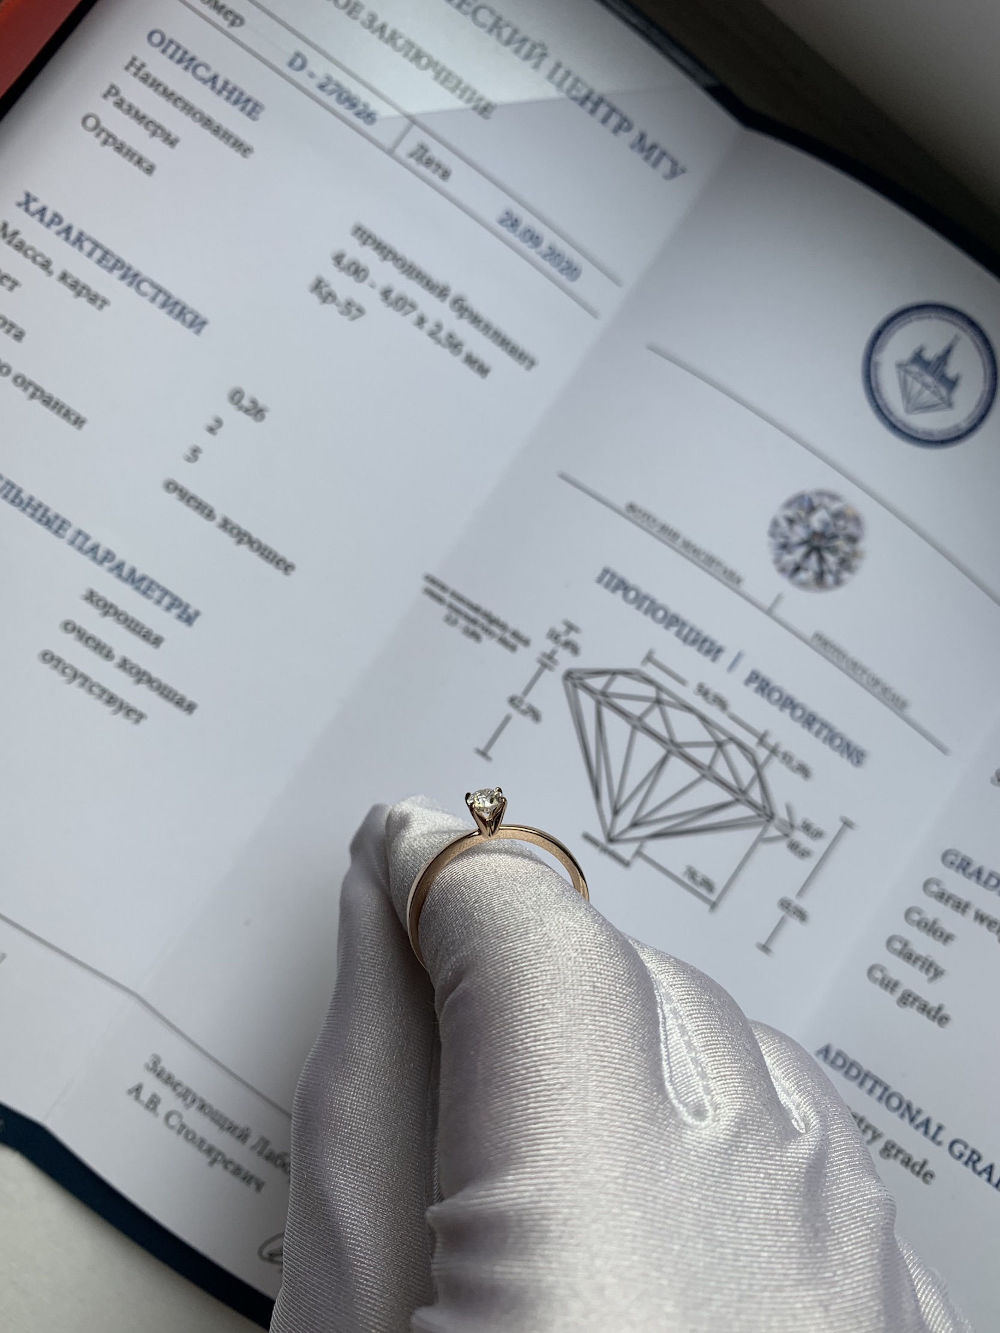 N24 - помолвочное кольцо из розового золота с бриллиантом 0.26 карат